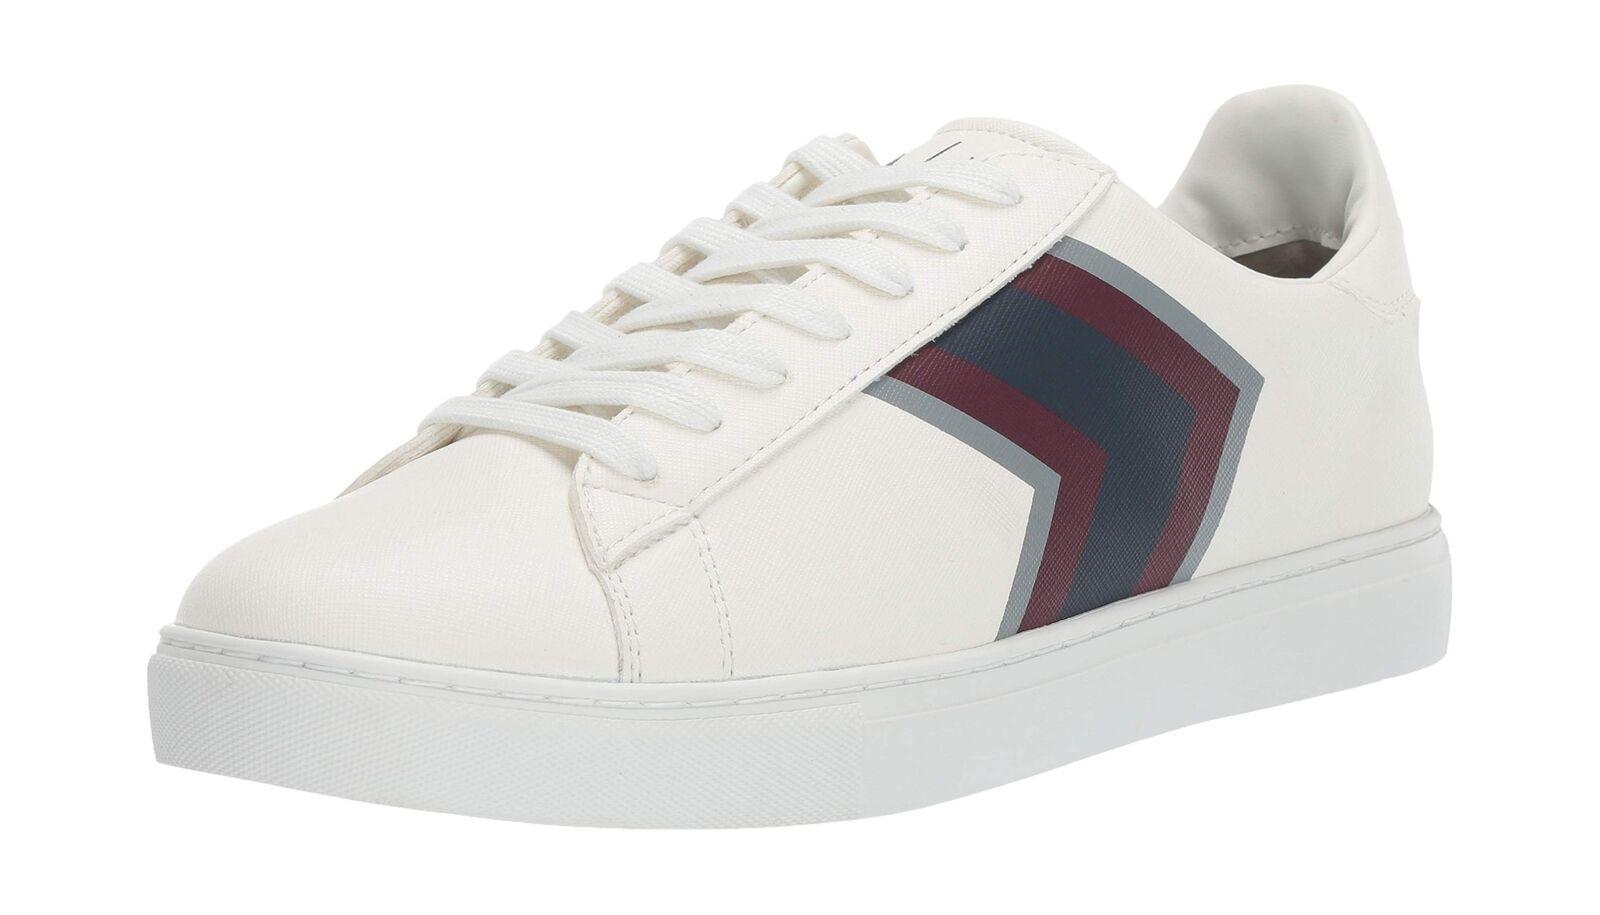 ARMANI Exchange Uomo Uomo Uomo FRECCIA Basse scarpe da ginnastica Scarpe Da Ginnastica bianca (bianca 00001) 8 UK d52f7b